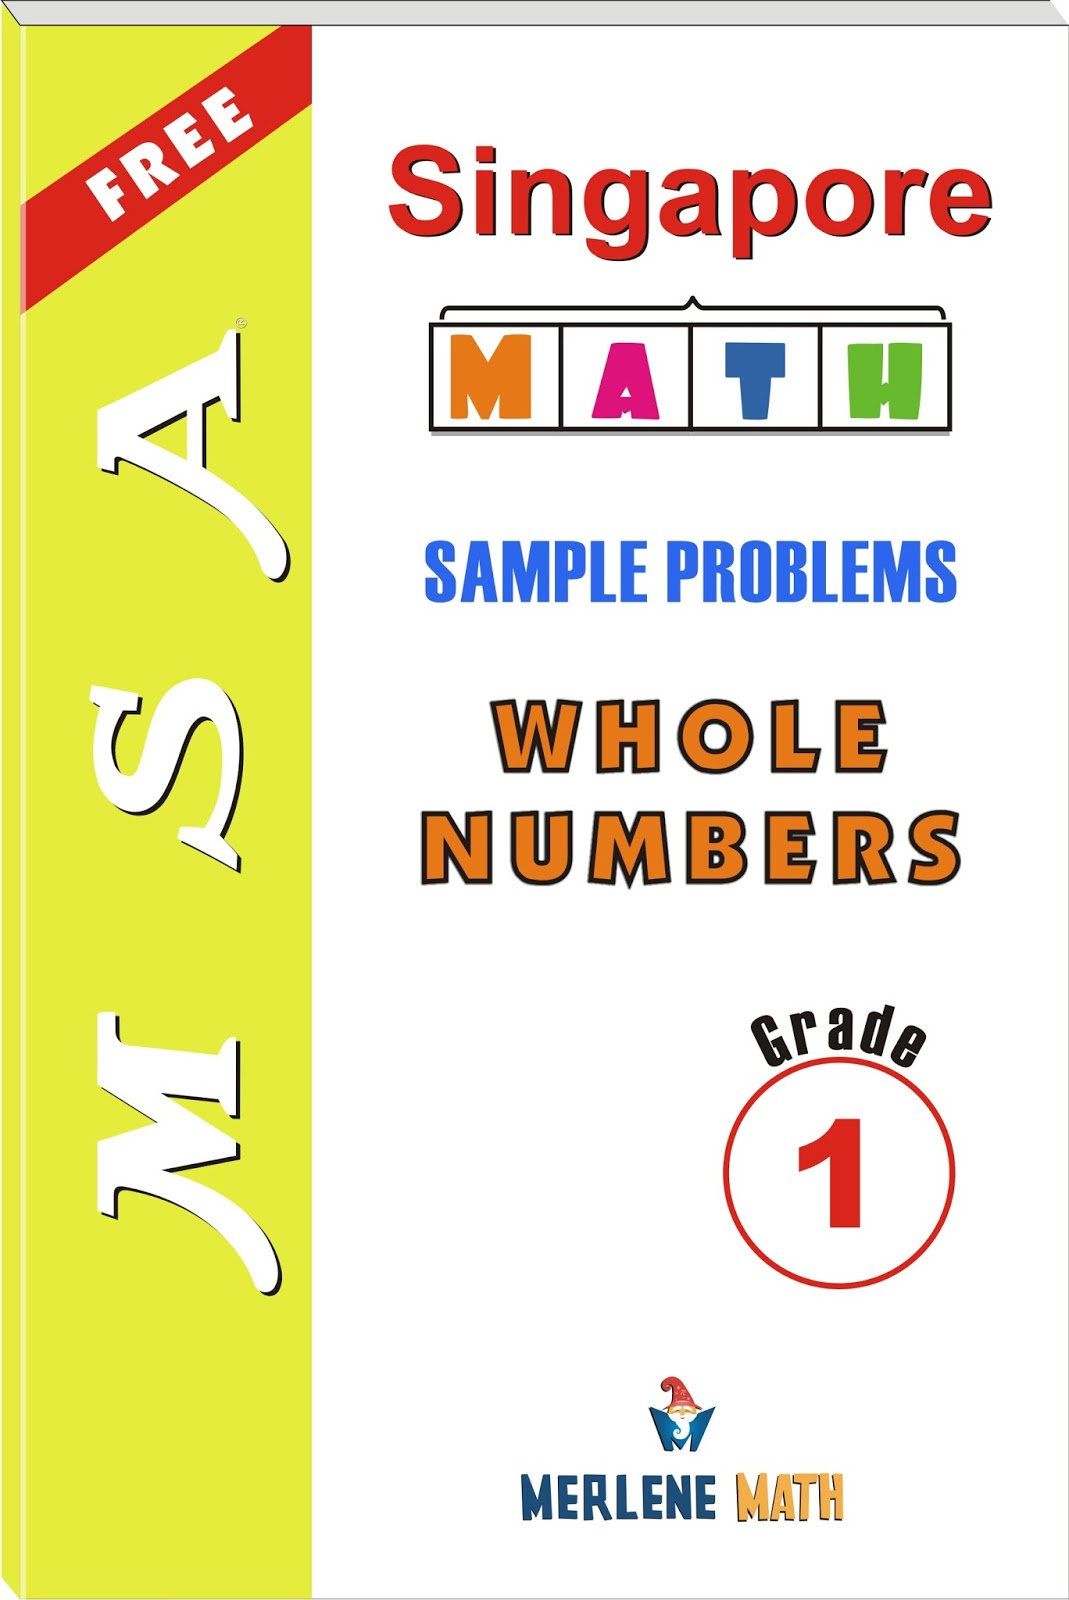 Singapore Math Books Singapore Math Sample Problems By Merle S Alferez